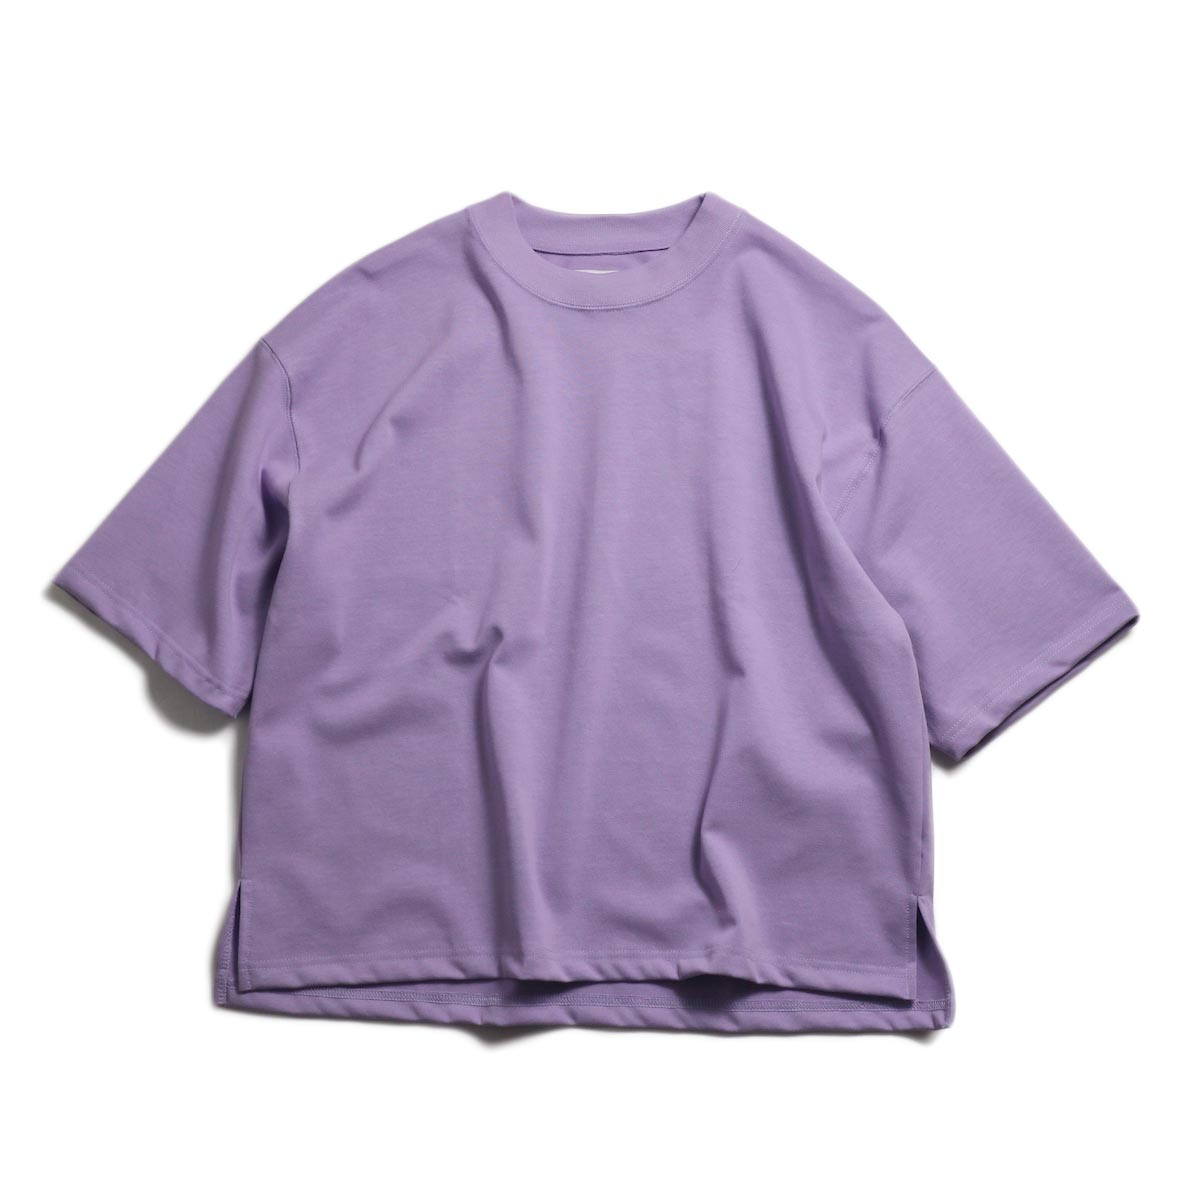 JANE SMITH / Big T Shirt -Purple